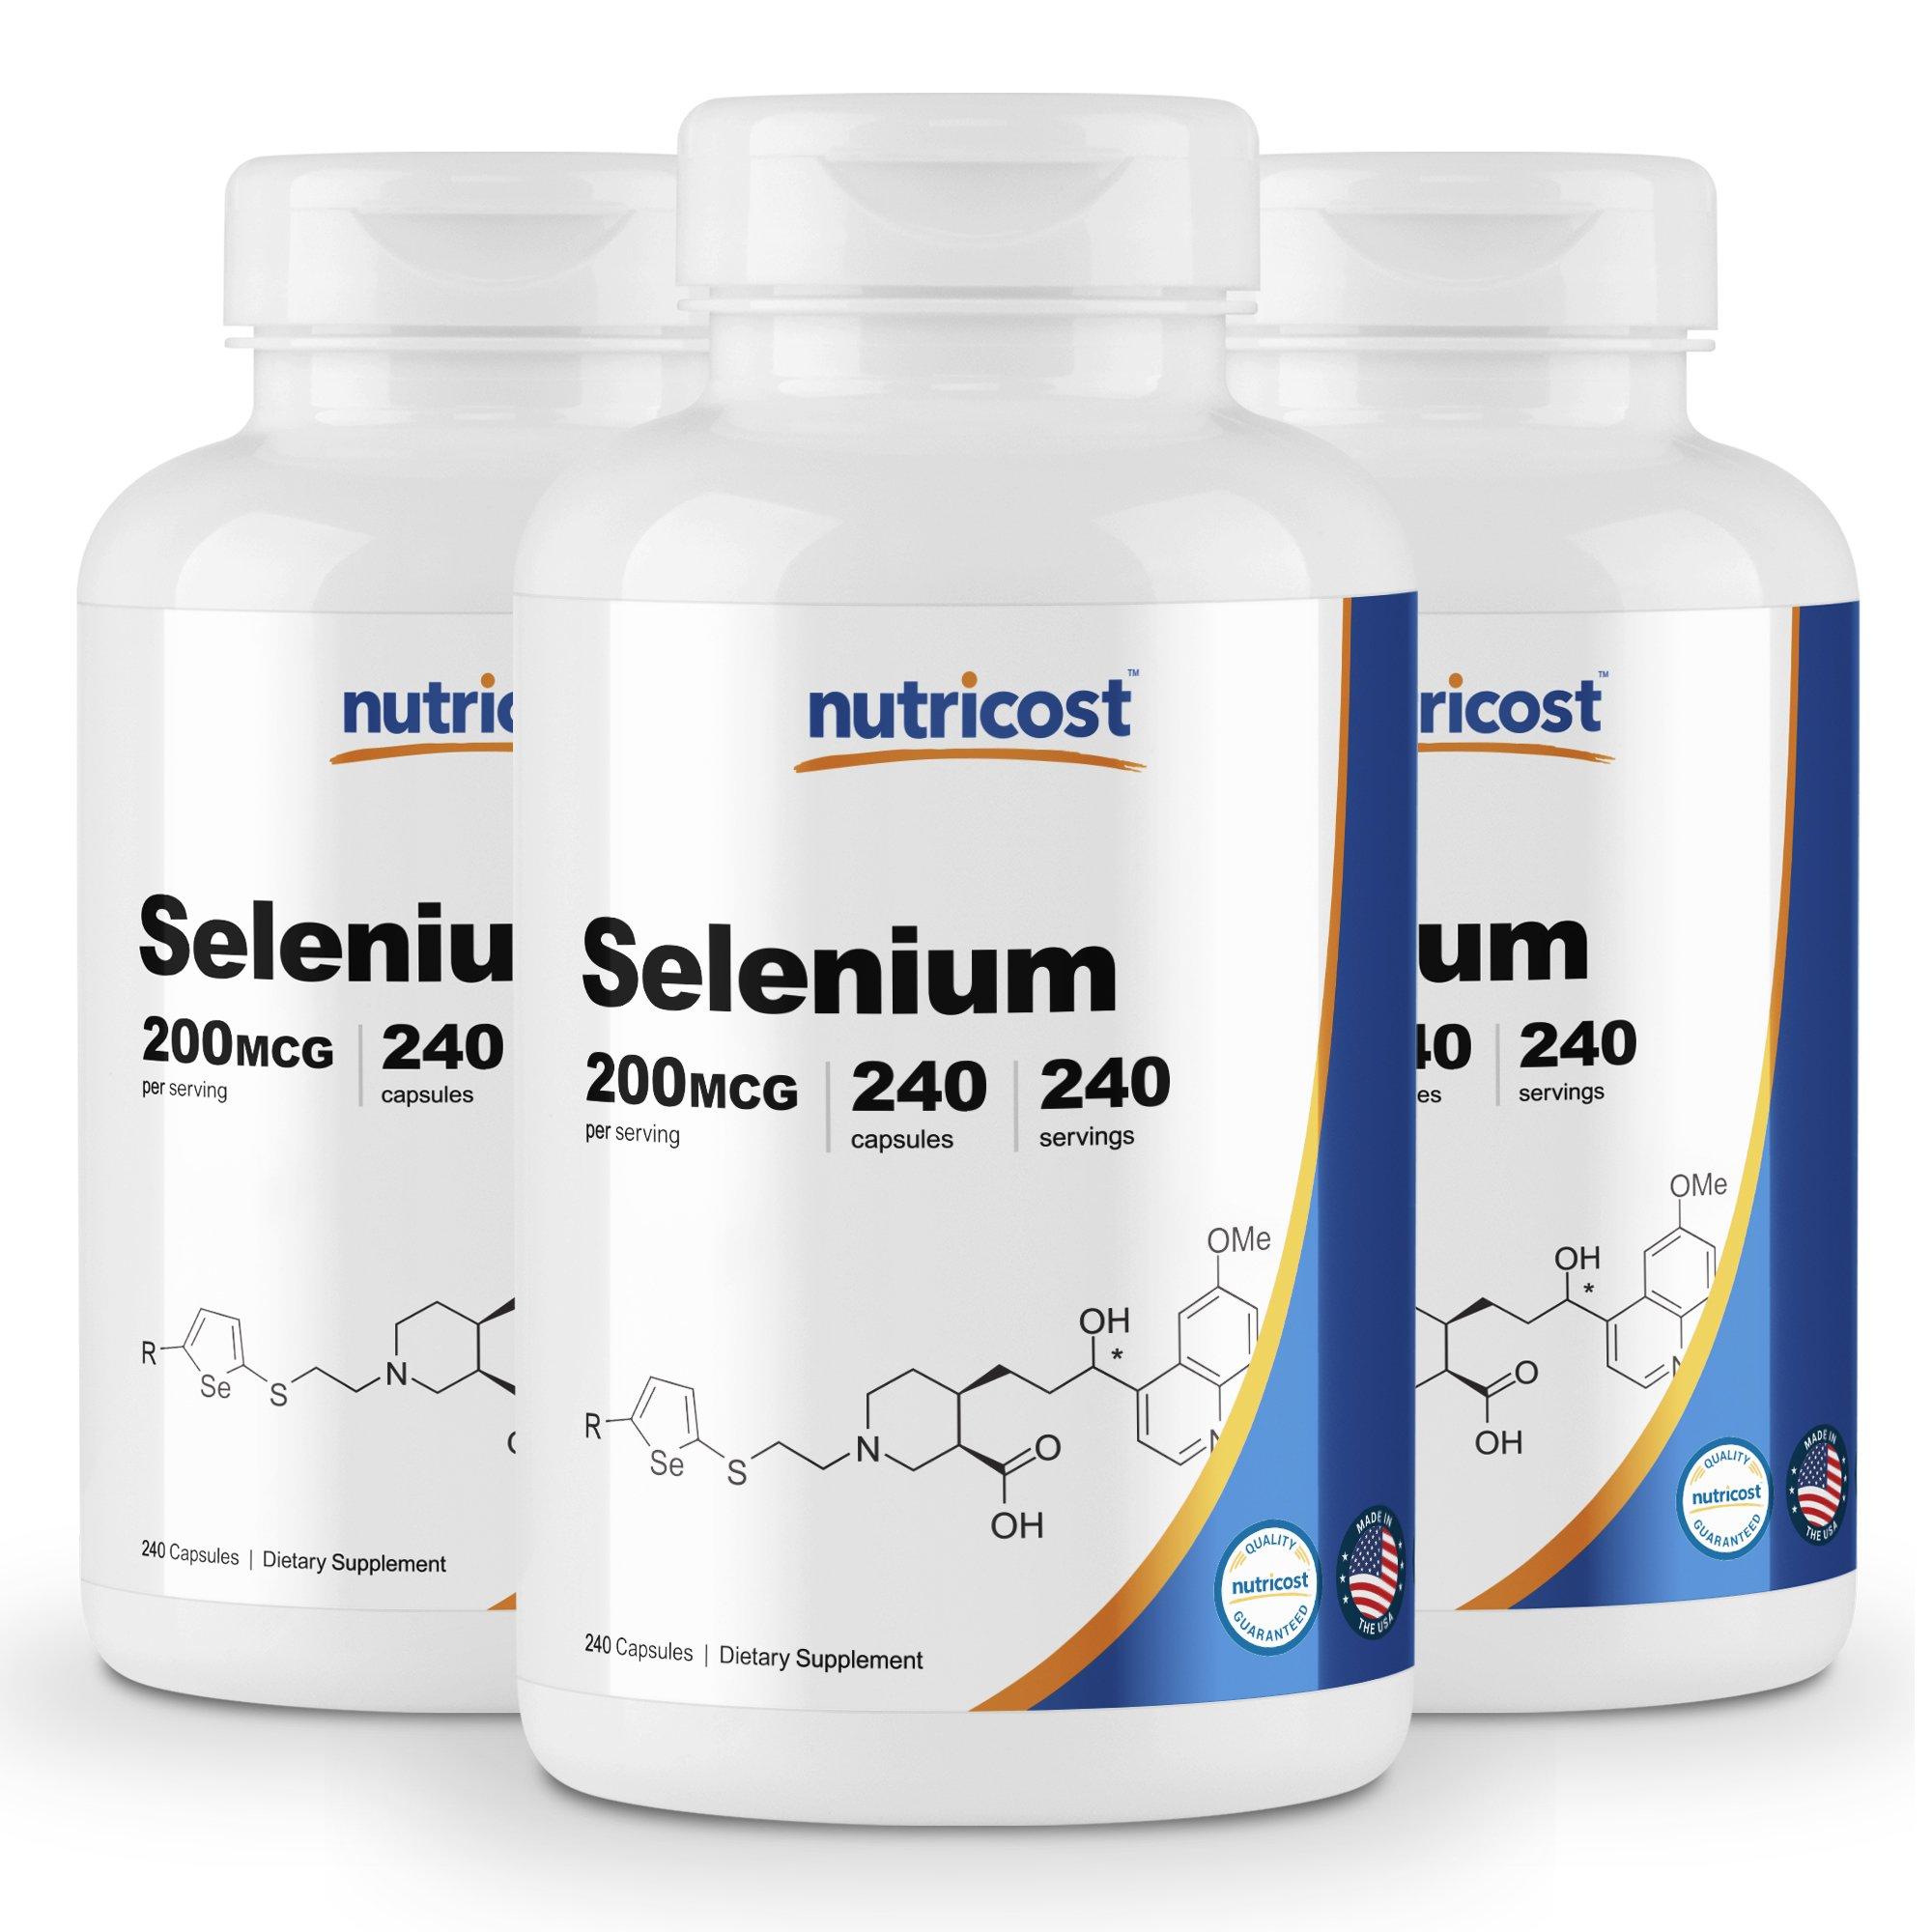 Nutricost Selenium 200mcg, 240 Veggie Caps (3 Bottles) - Non-GMO, Gluten Free L-Selenomethionine ...